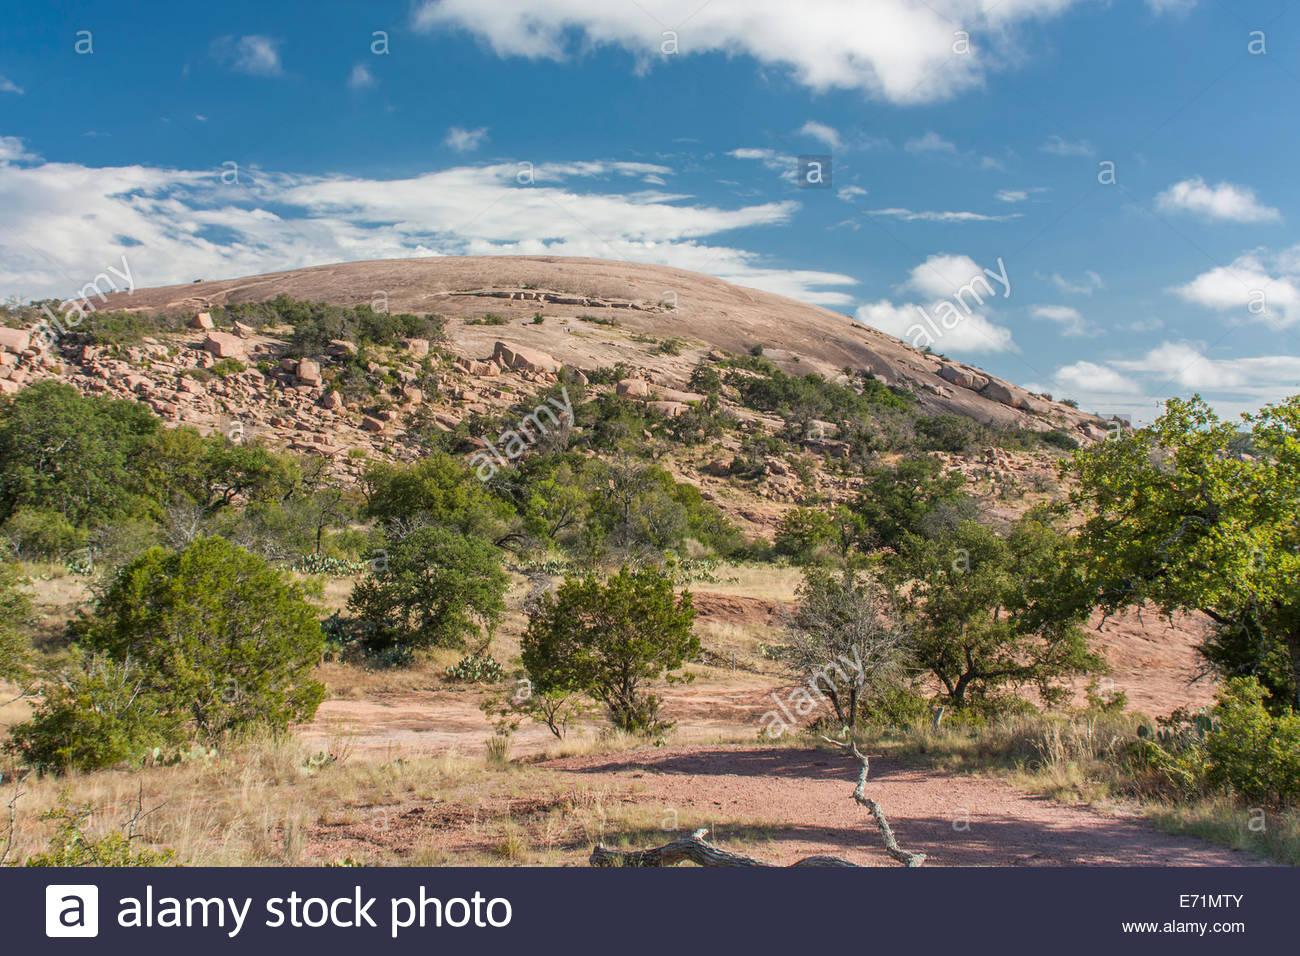 A Landscape image of Enchanted Rock near Fredericksburg, Texas - Stock Image